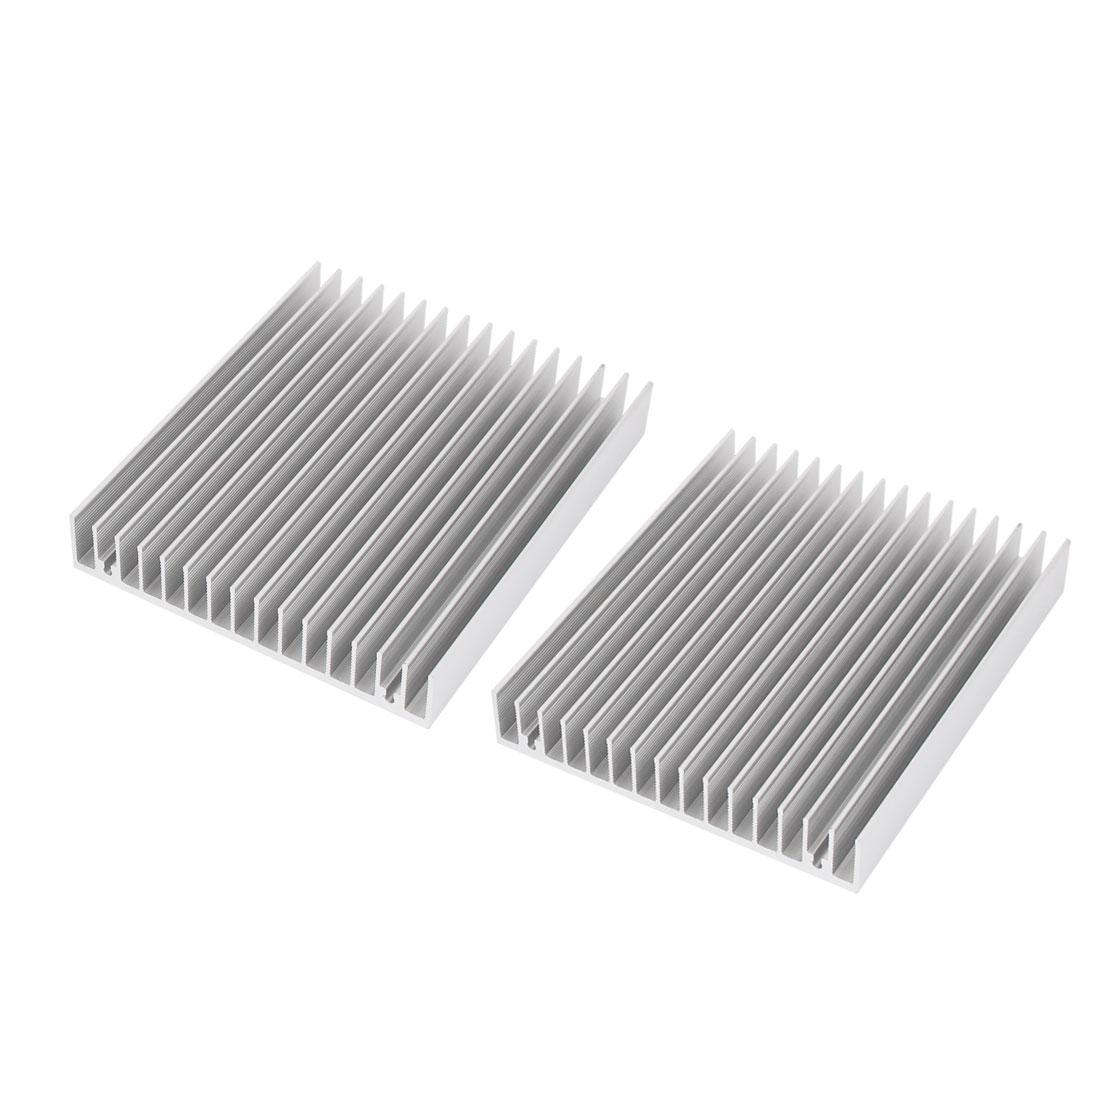 2 Pcs Aluminum Heat Sink DIY 120x100x18mm CPU HeatSink Cooling Fin Silver Tone